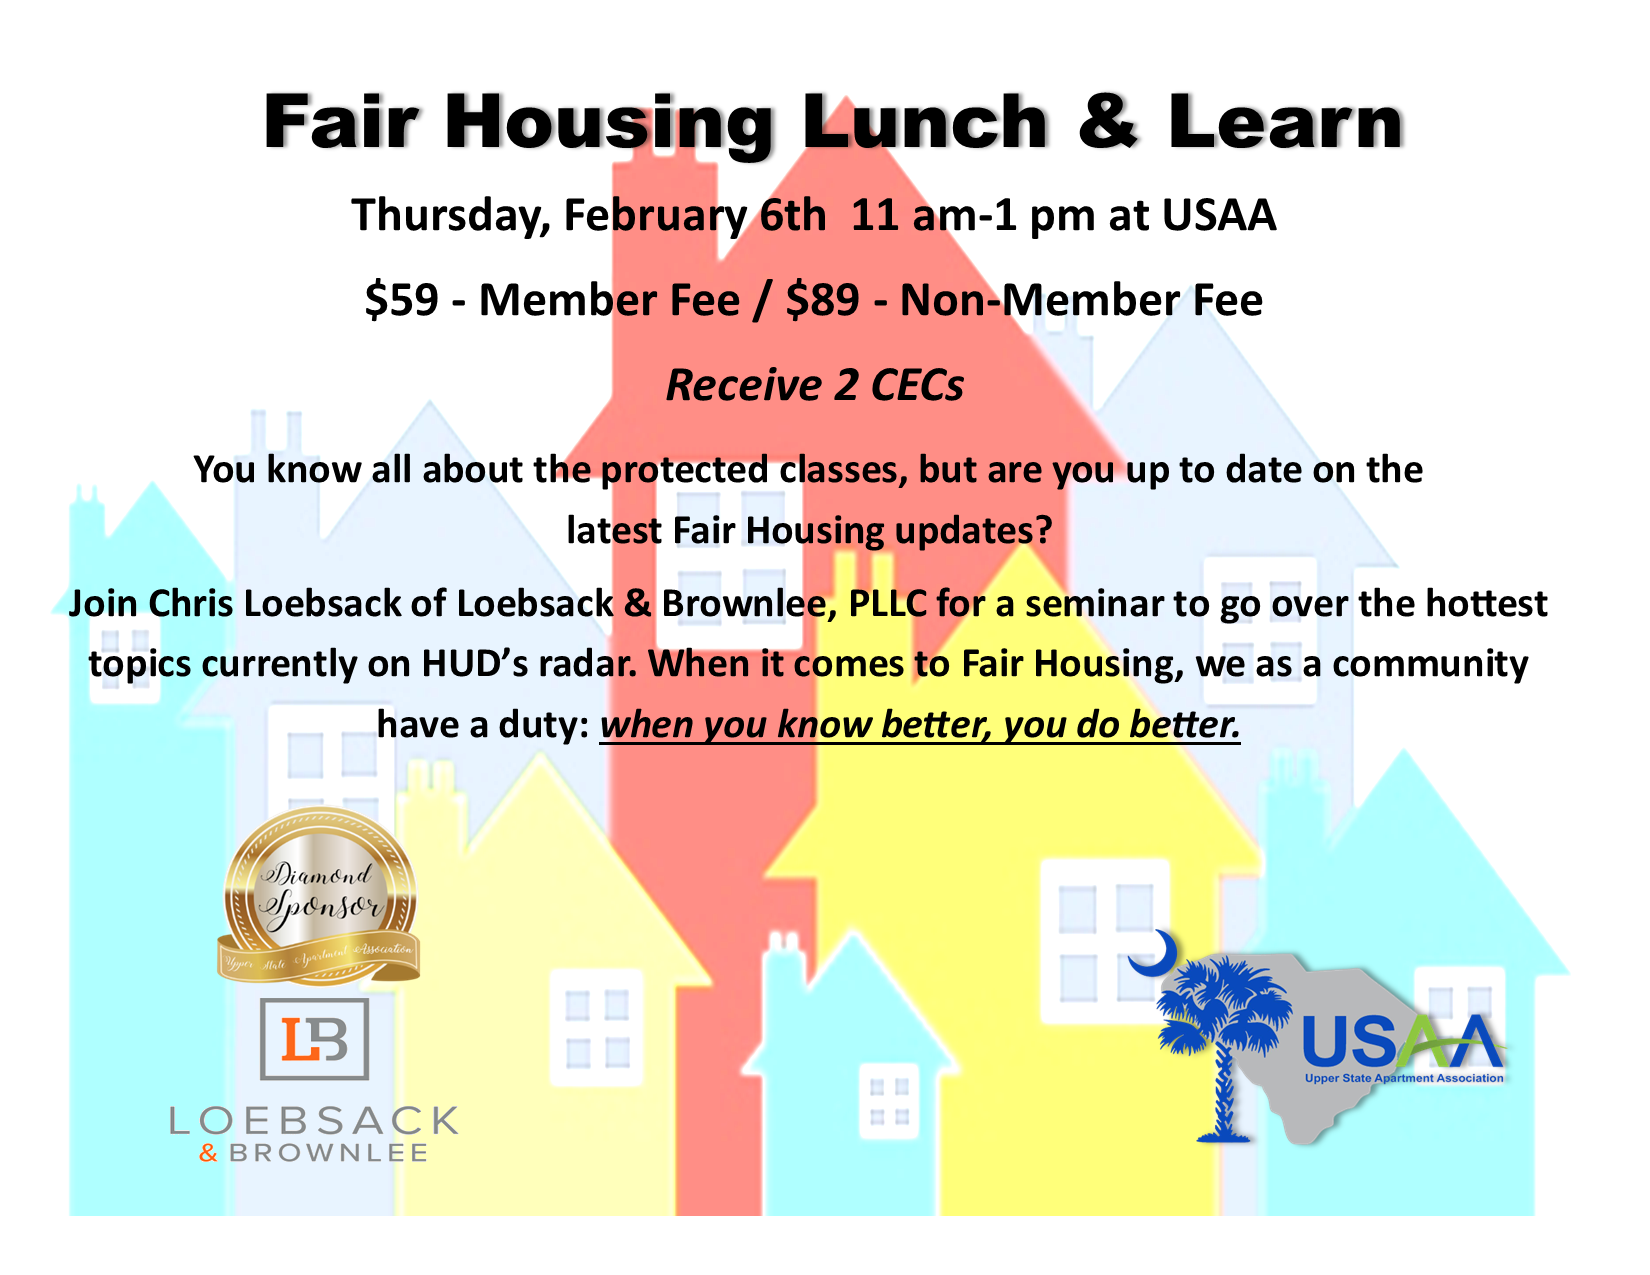 Fair Housing Course Upper State Apartment Association